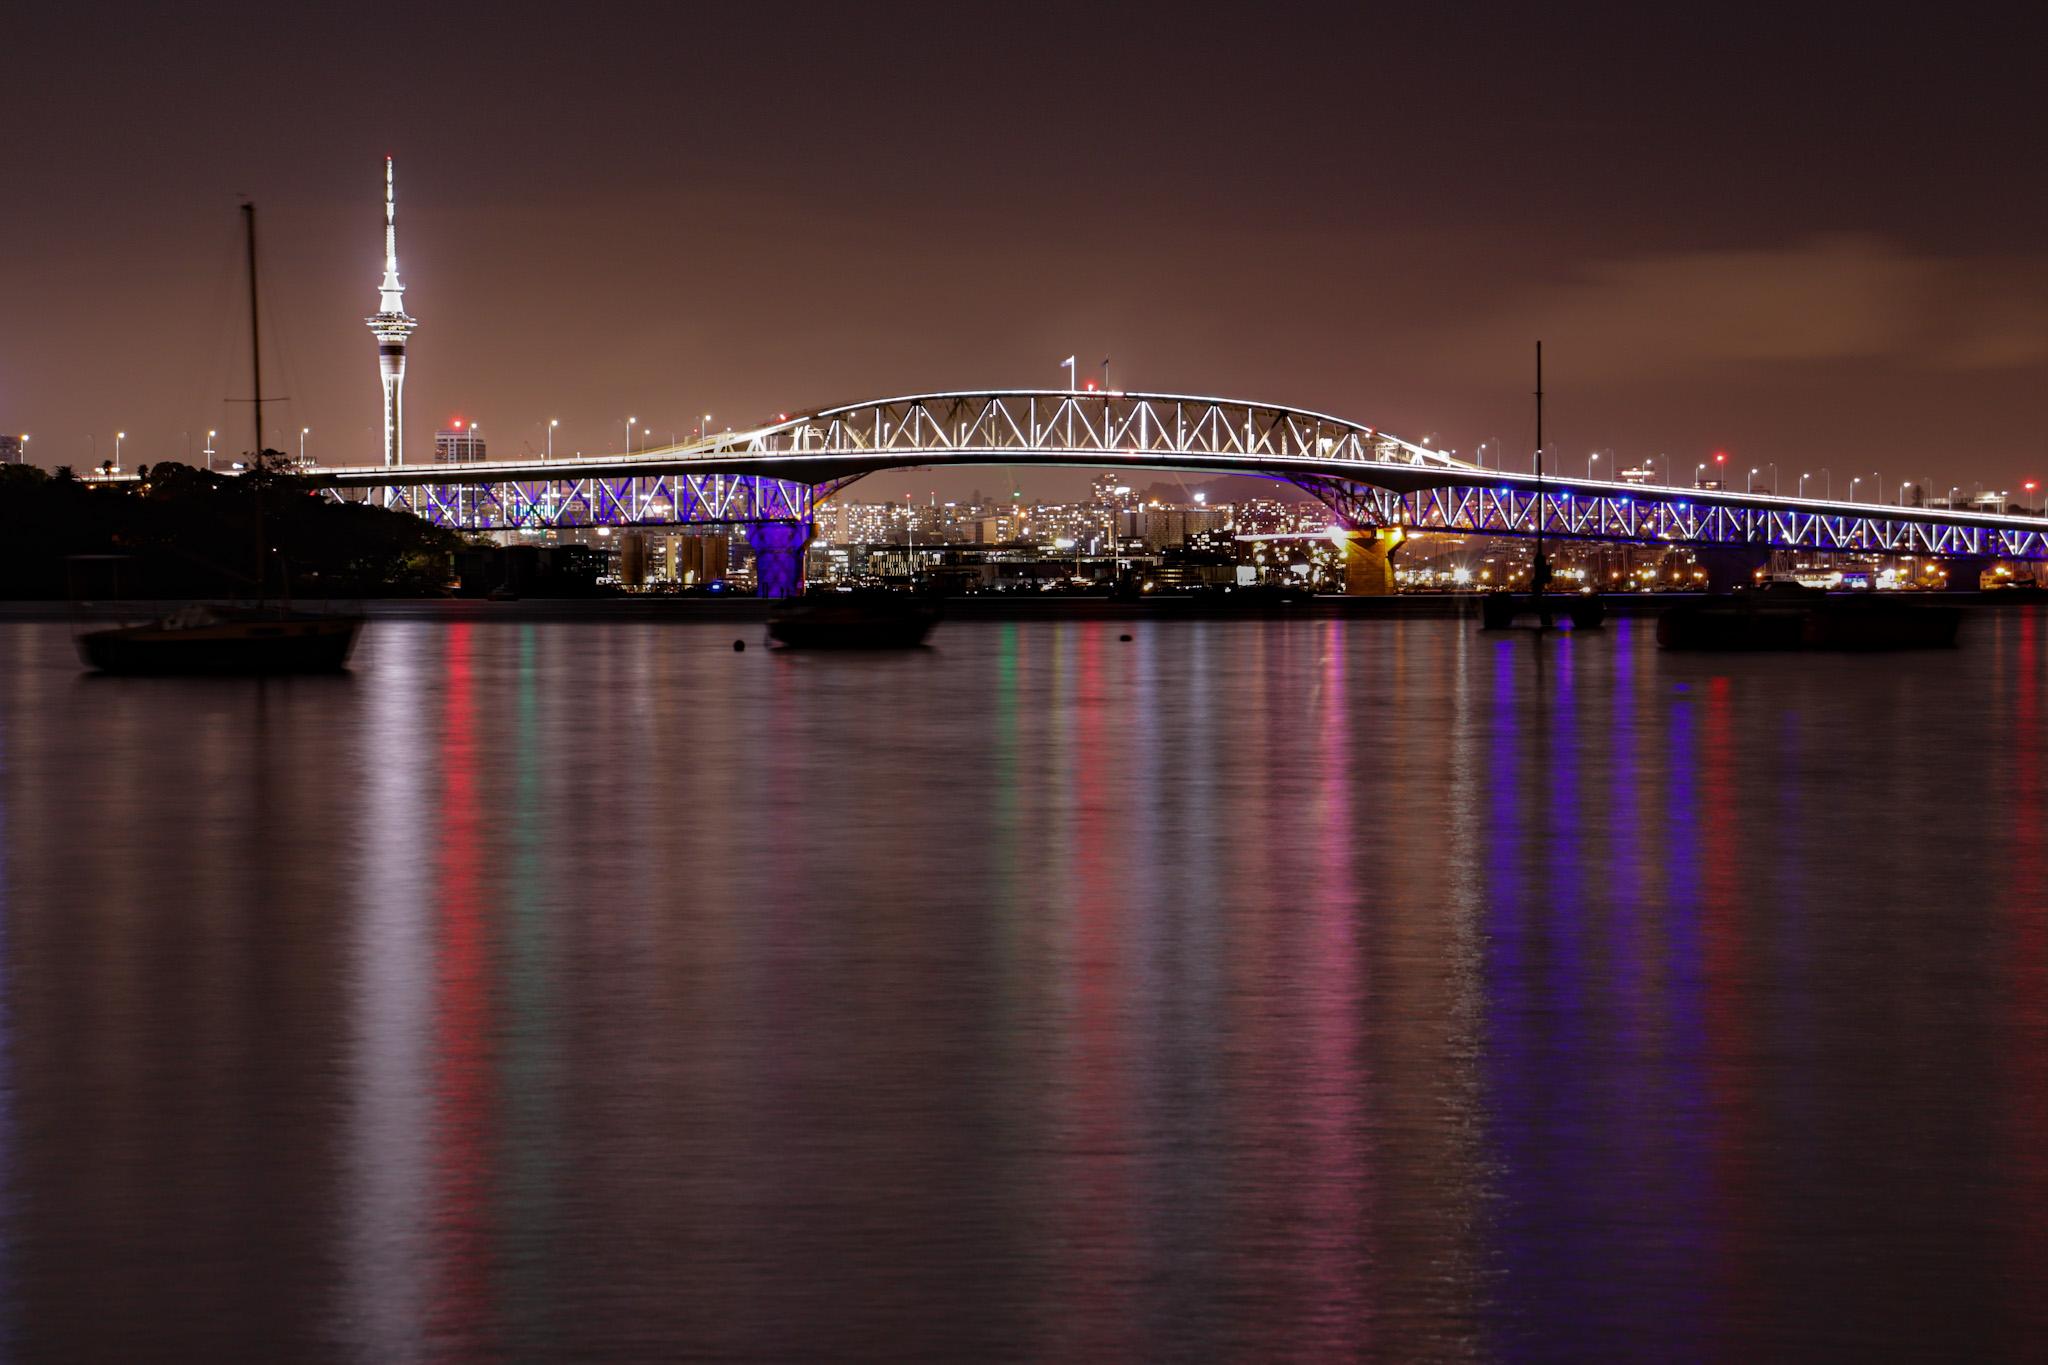 Auckland Bridge and Skycity Tower, New Zealand